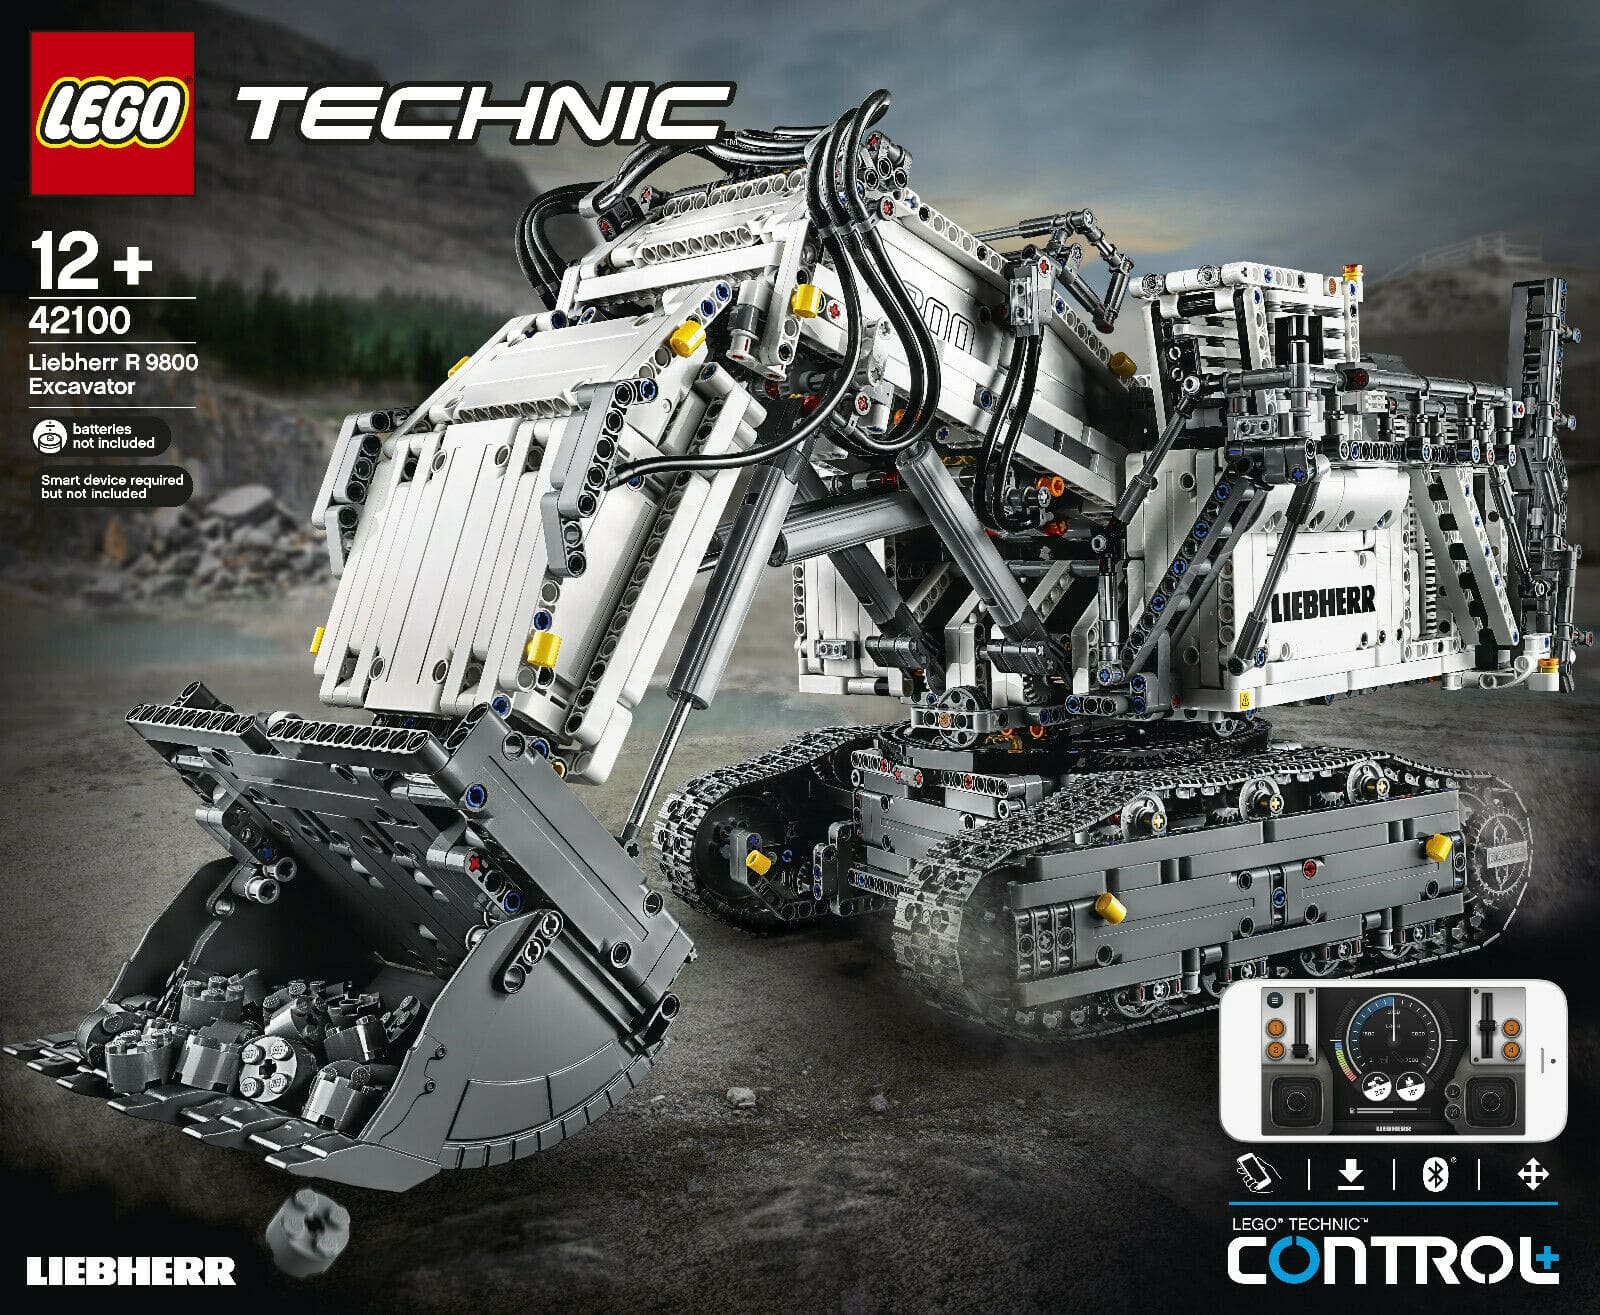 LEGO Technic 42100 Liebherr R9800 Boxart